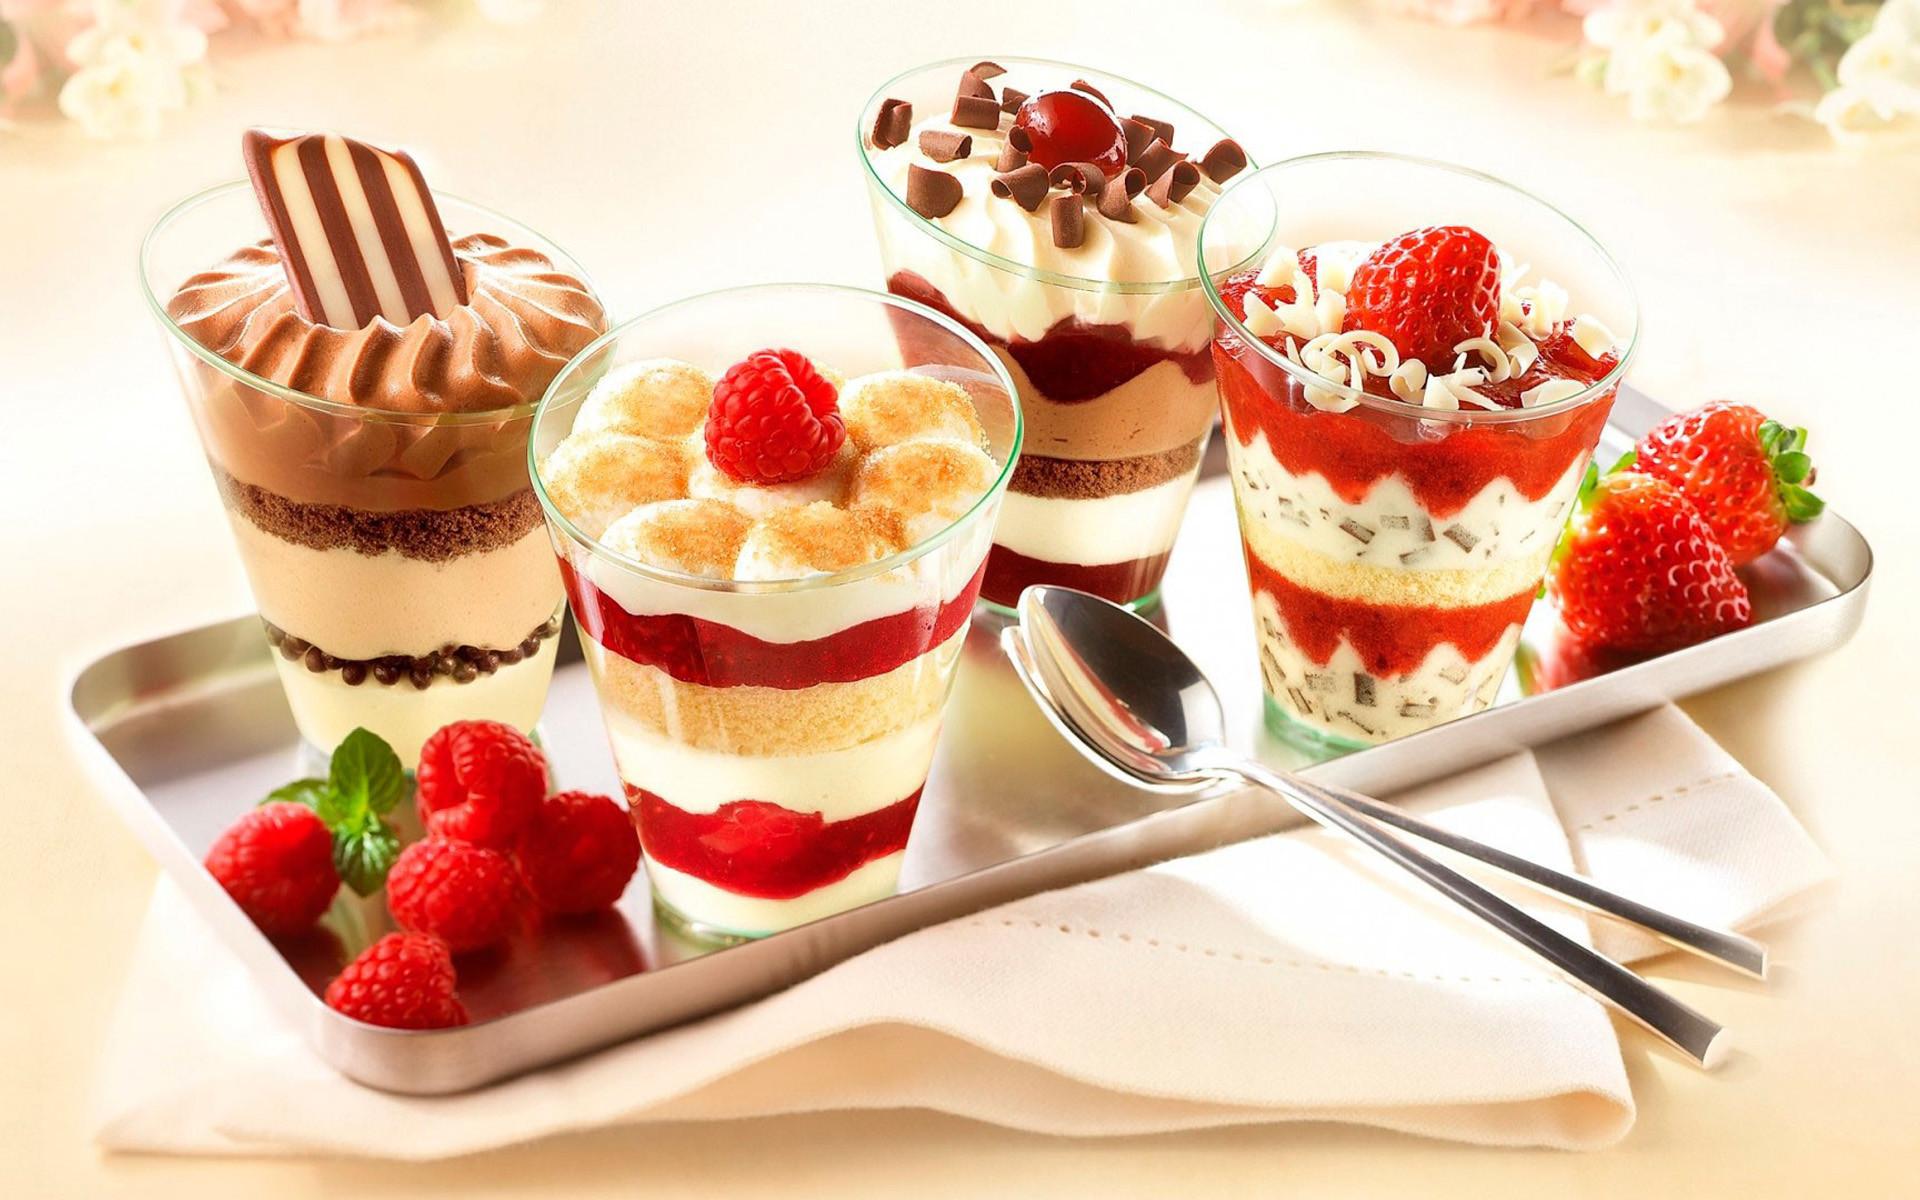 Dessert Ice Cream  Best Ice Cream Parlours in Kolkata you must visit this season